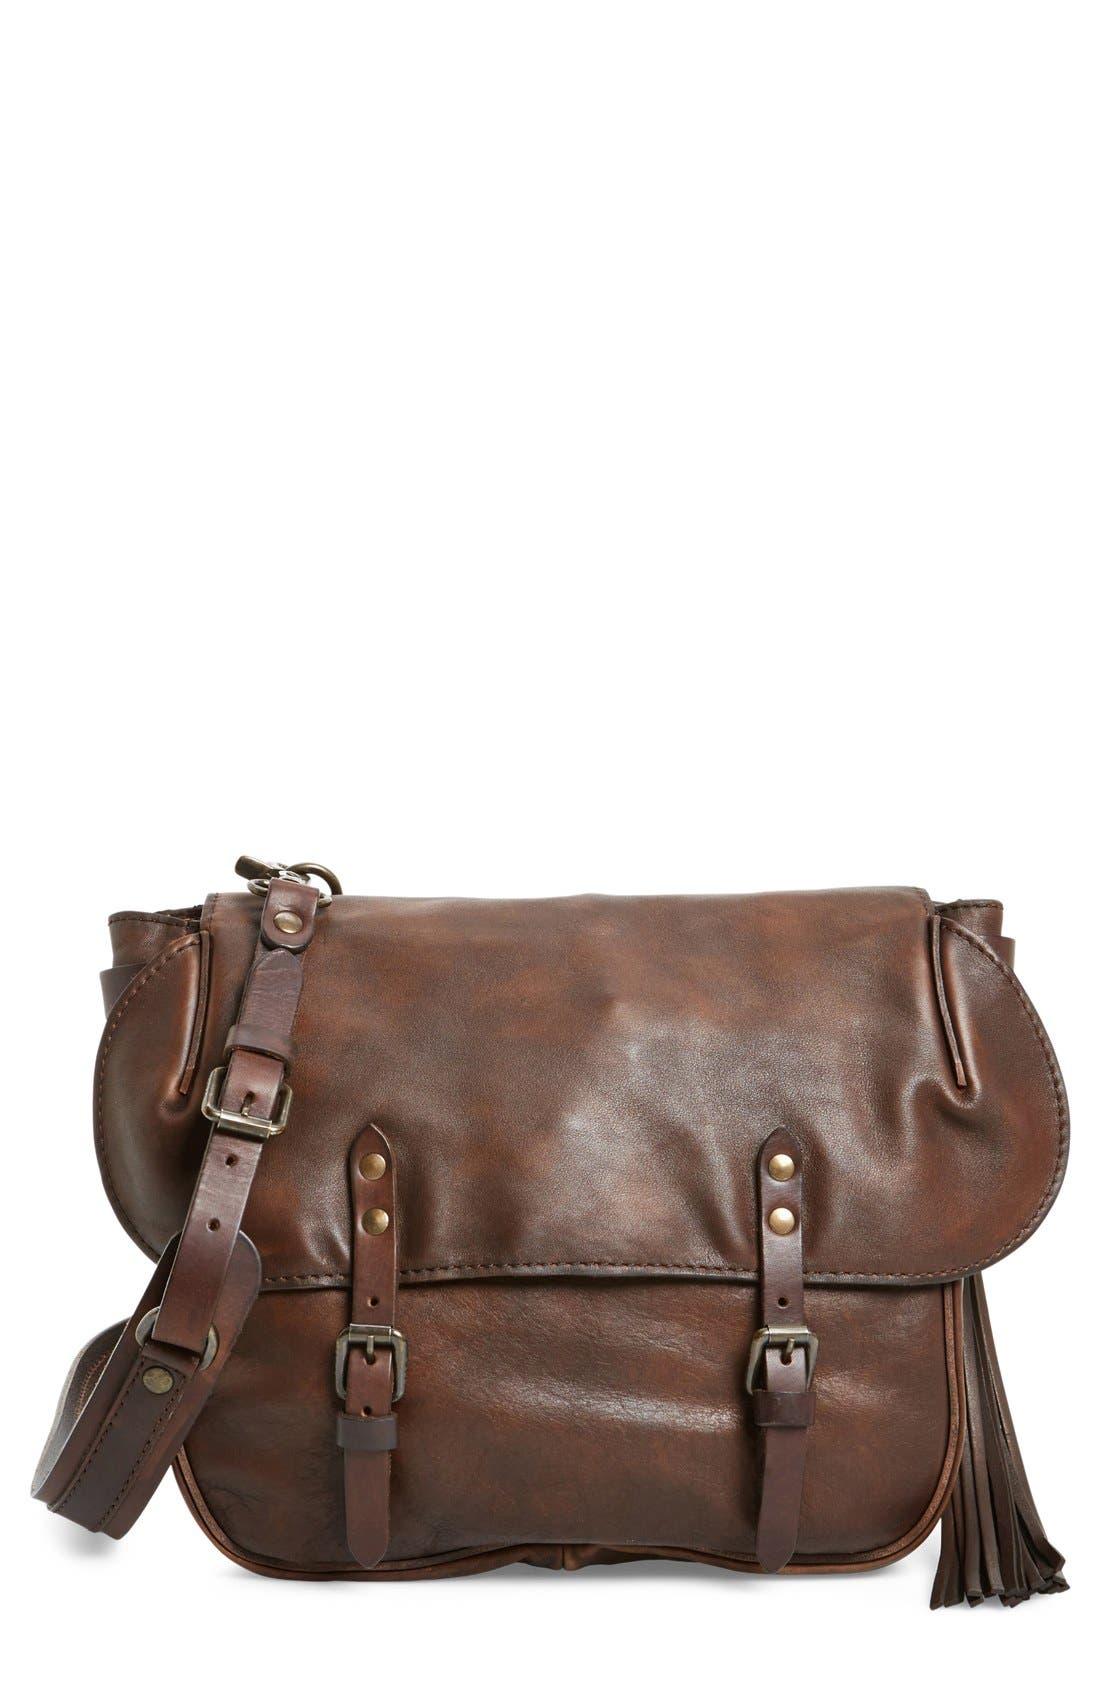 Alternate Image 1 Selected - Frye 'Veronica' Crossbody Bag